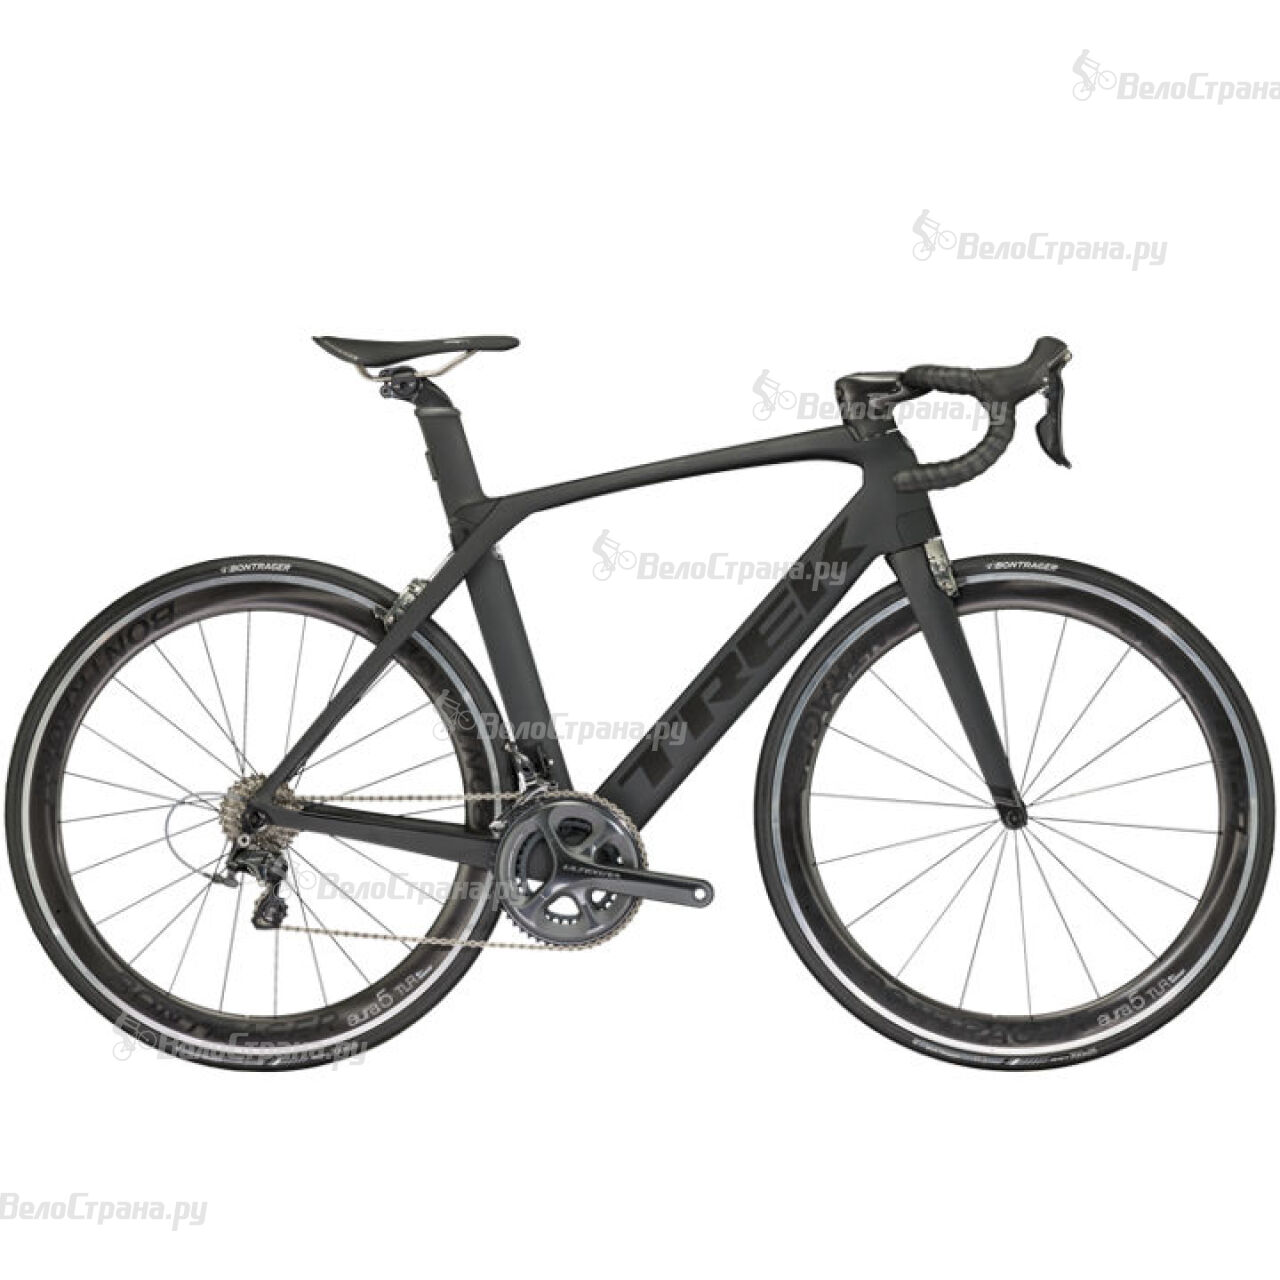 Велосипед Trek MADONE 9.2 C H2 (2017) велосипед trek madone 3 1 wsd 2013